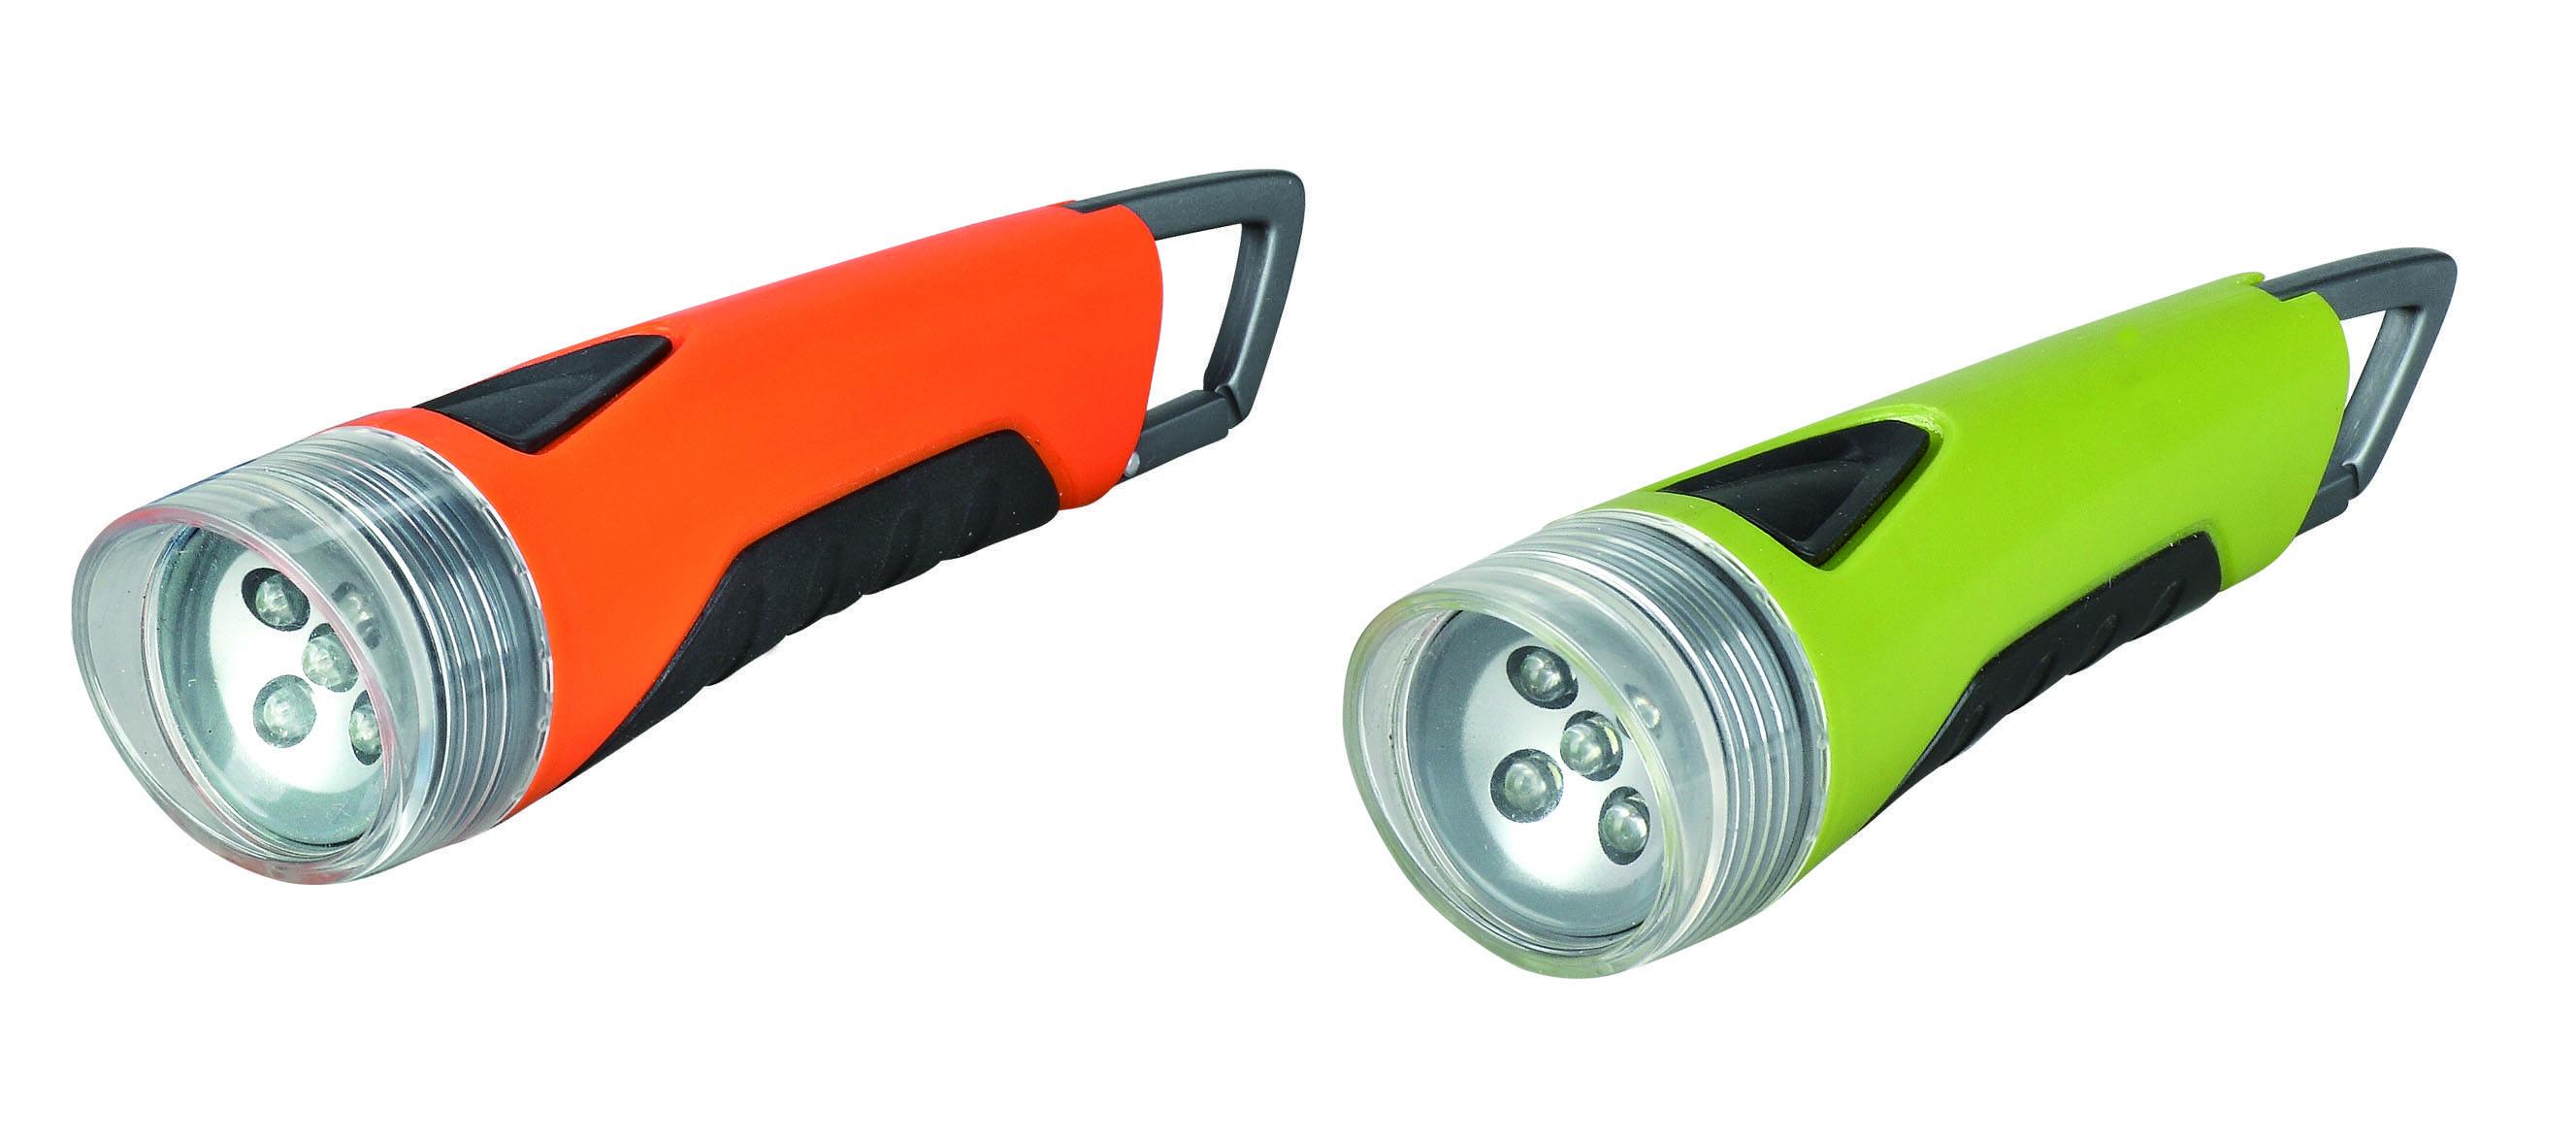 Plastic Clip 5 LED multifunction camping torch 3xAAA battery super powerful Hiking Aluminium LED fla